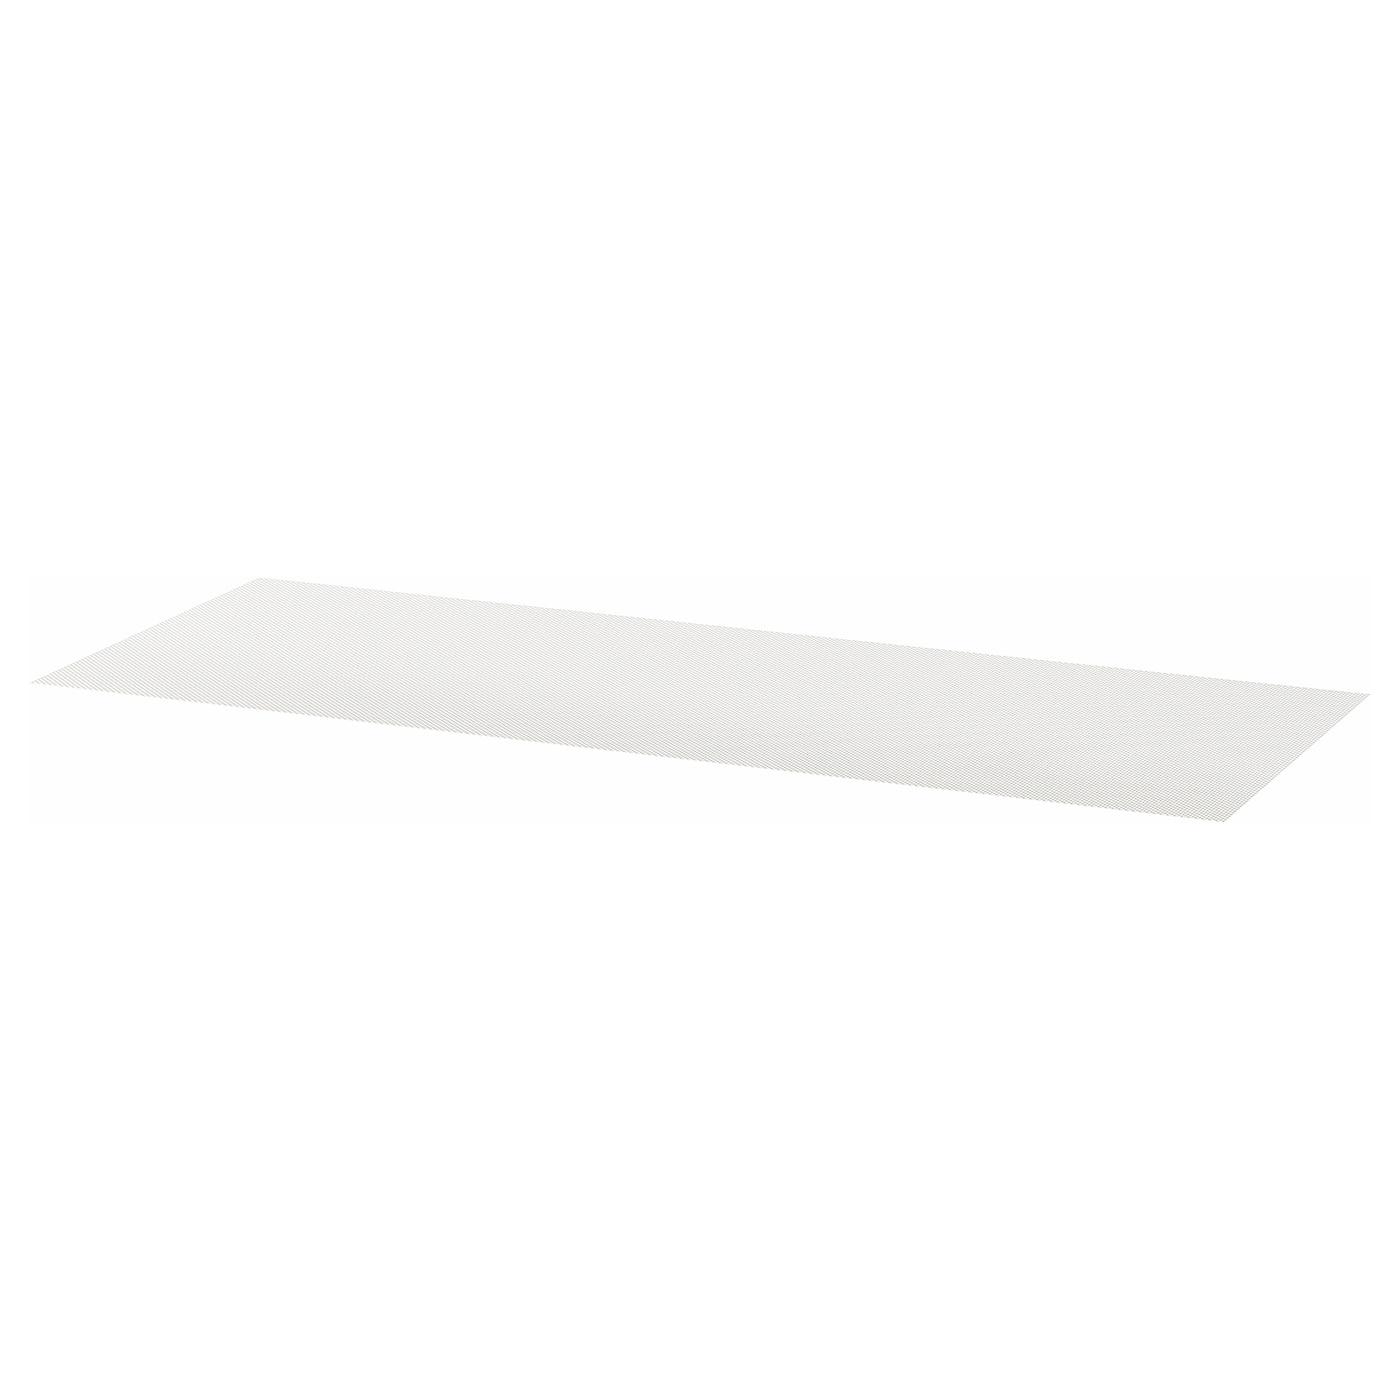 Cassettiera Per Armadio Ikea variera drawer mat - transparent